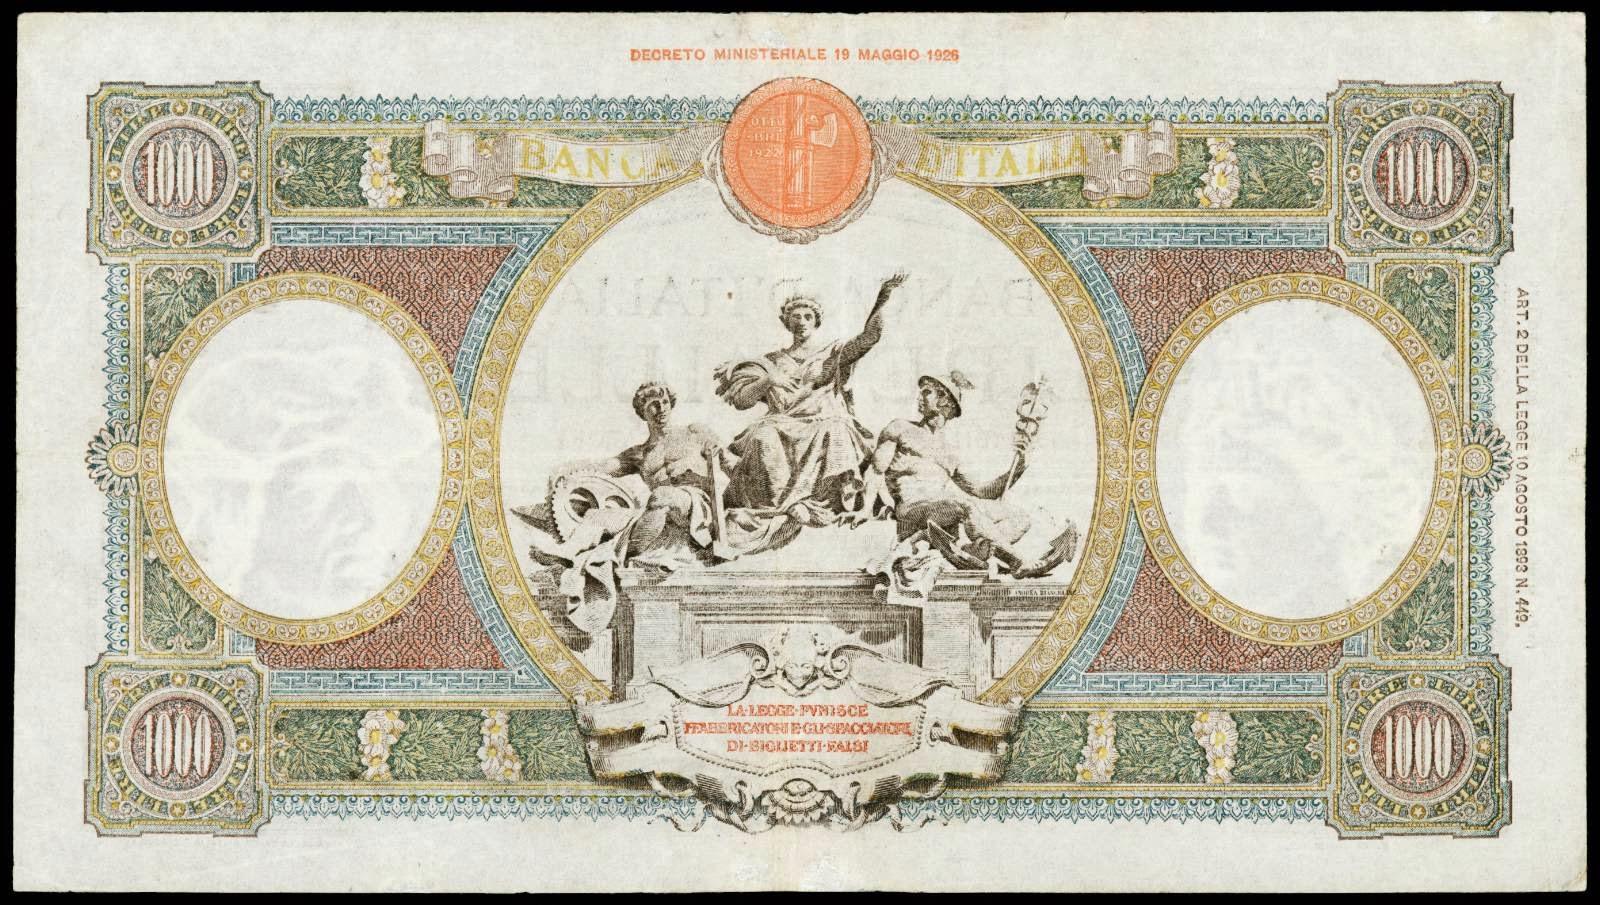 1000 Italian Lira banknote